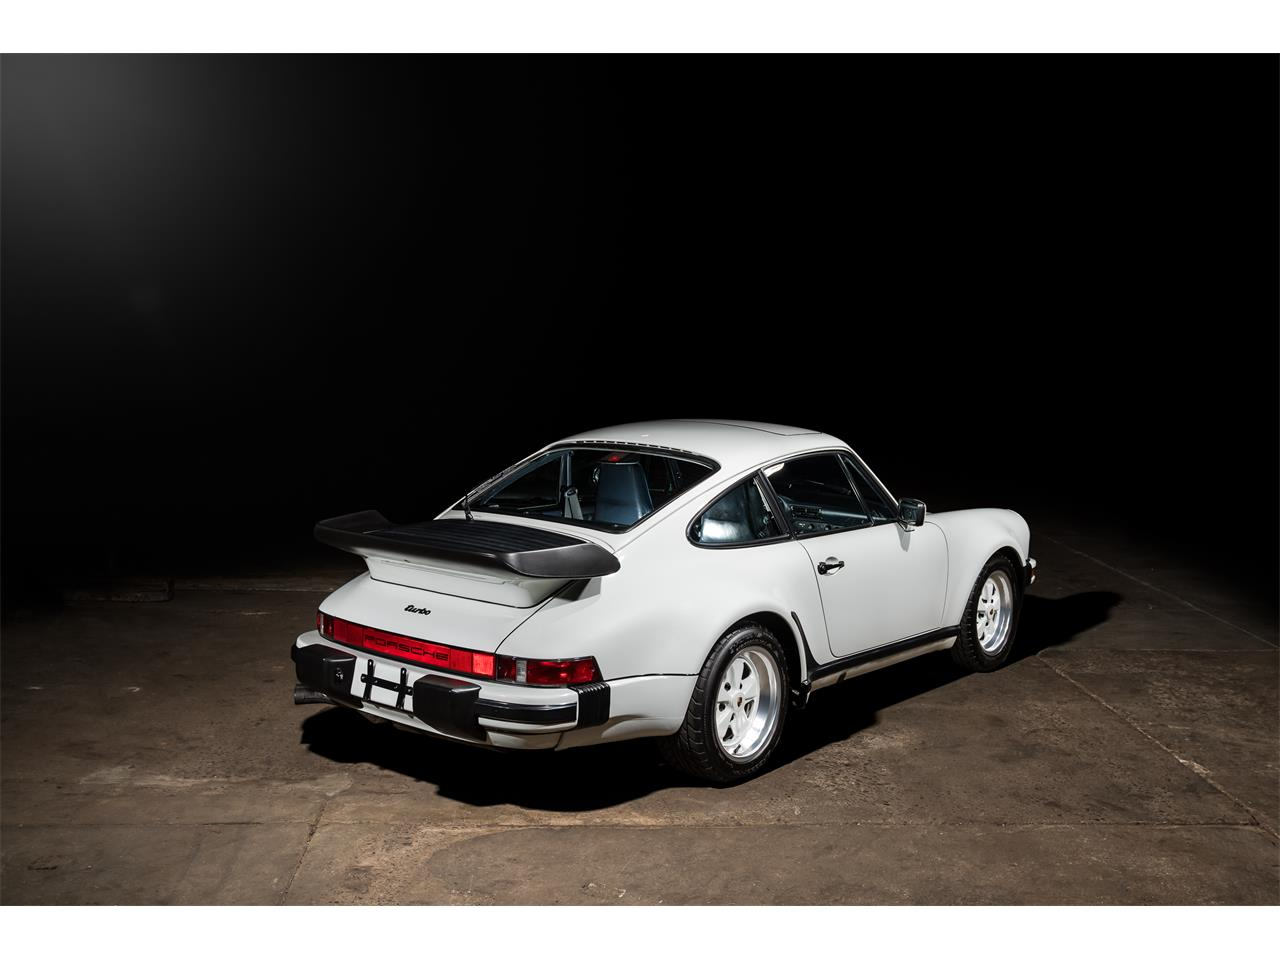 Large Picture of '89 Porsche 930 Turbo - $155,000.00 - QXI9